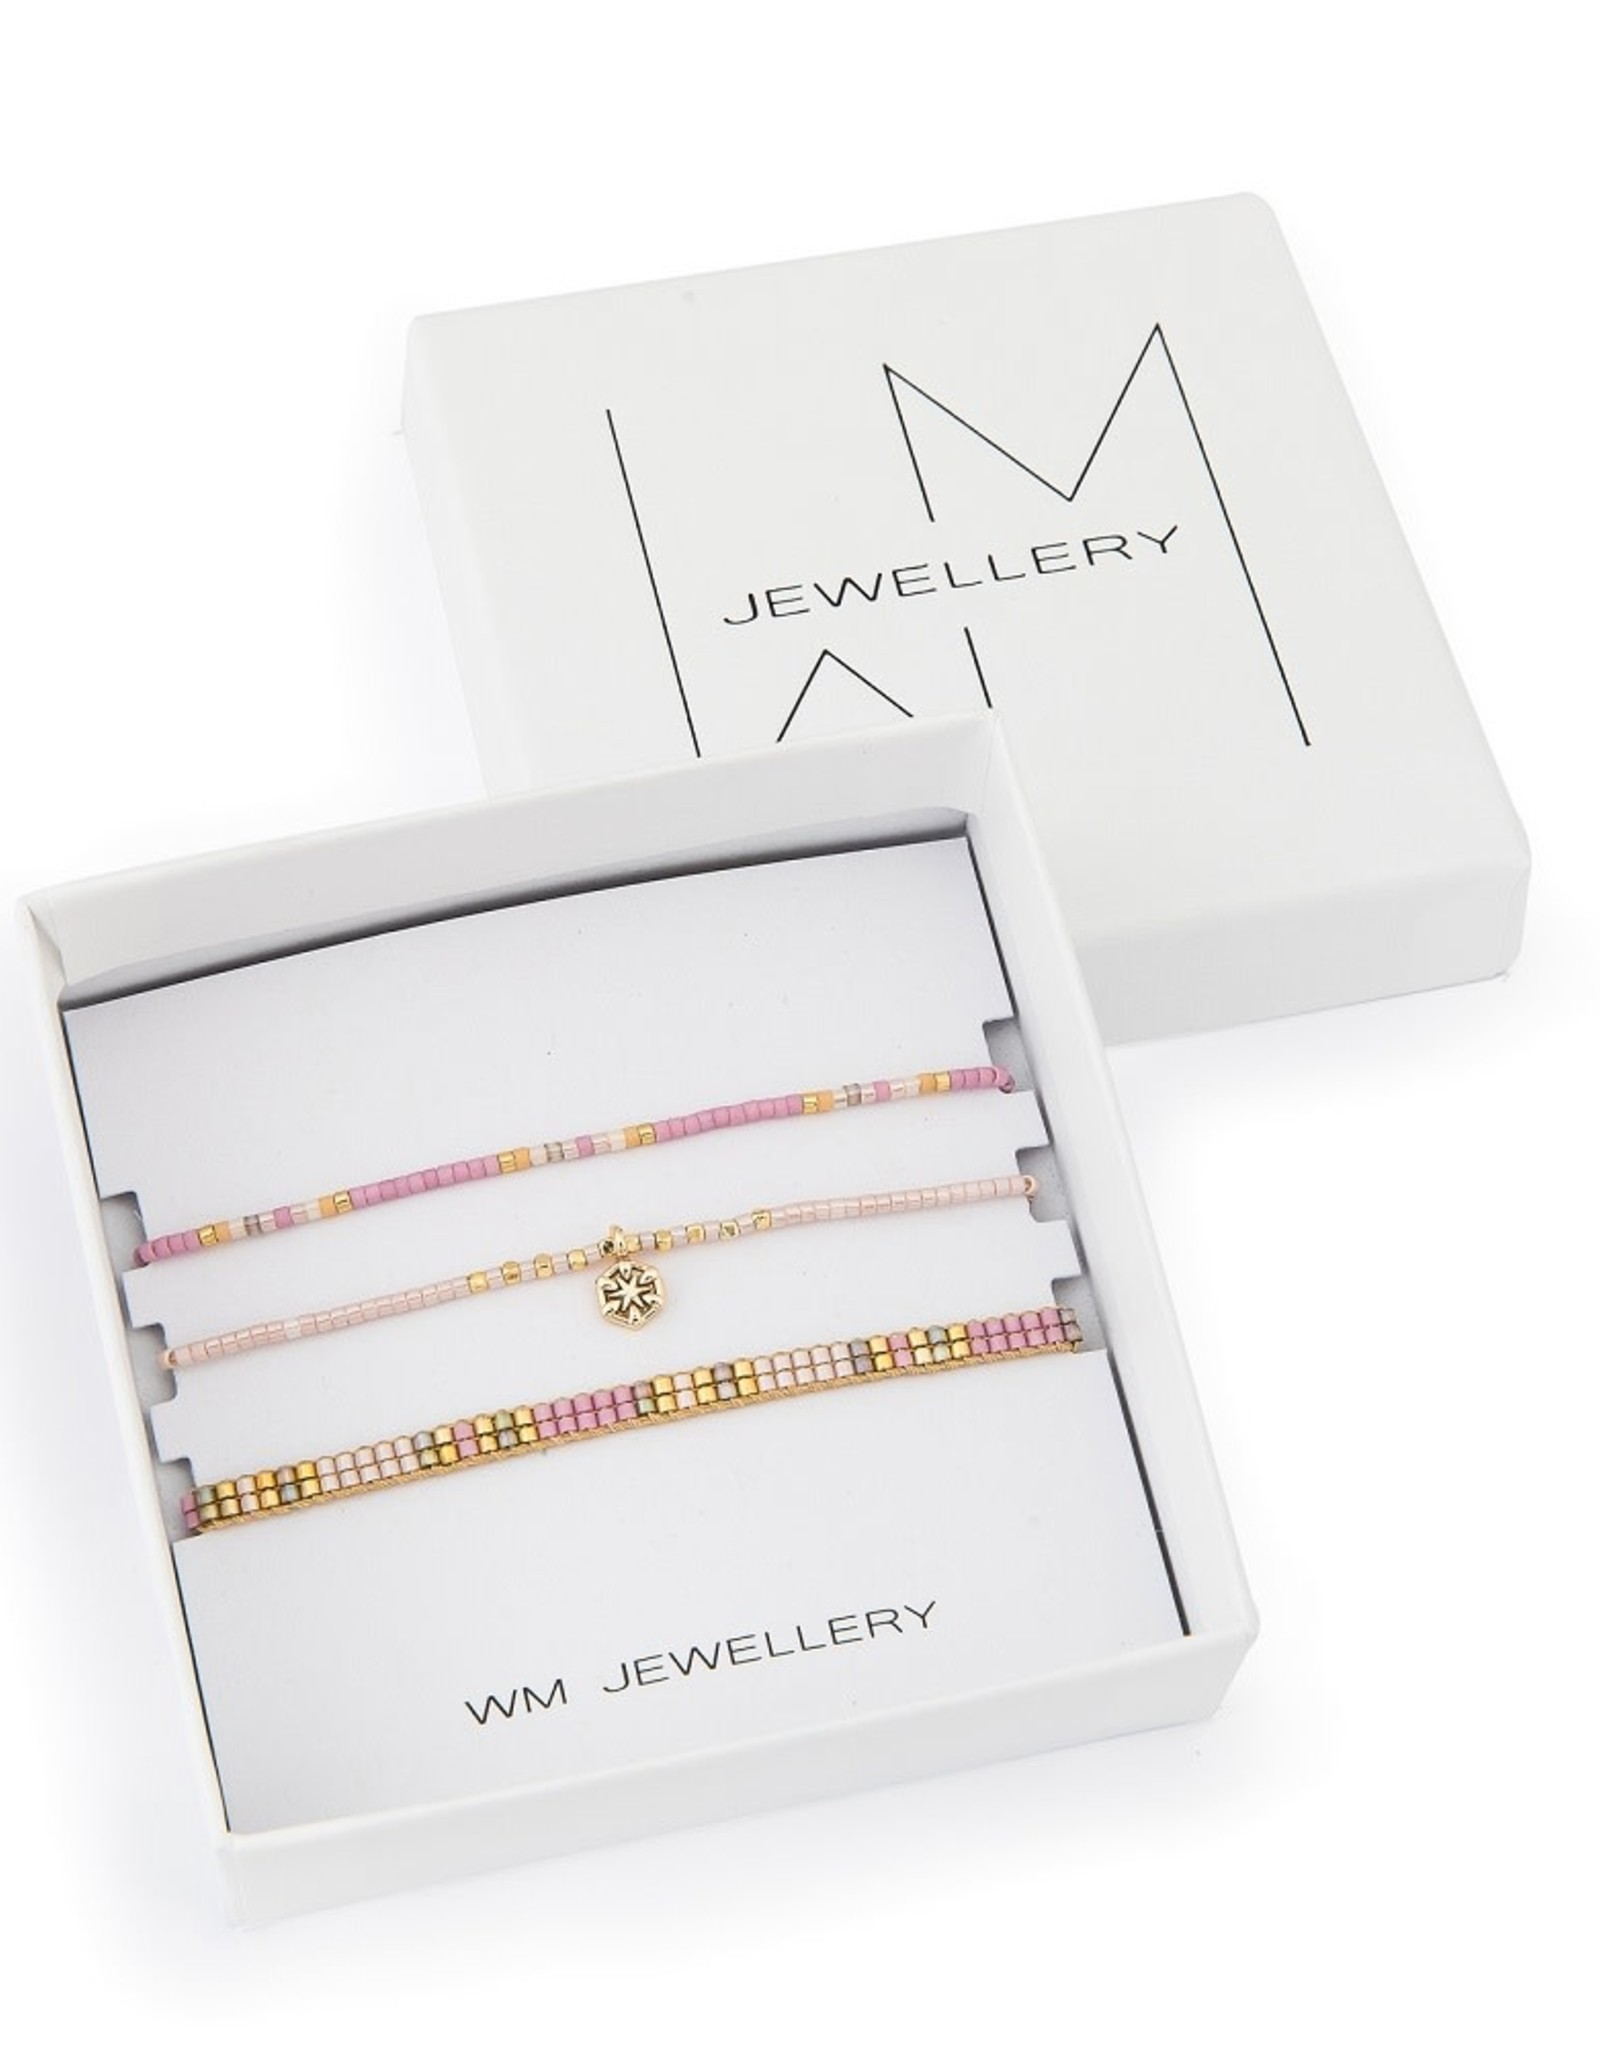 WM jewellery WM Jewellery spring gift box nr 5